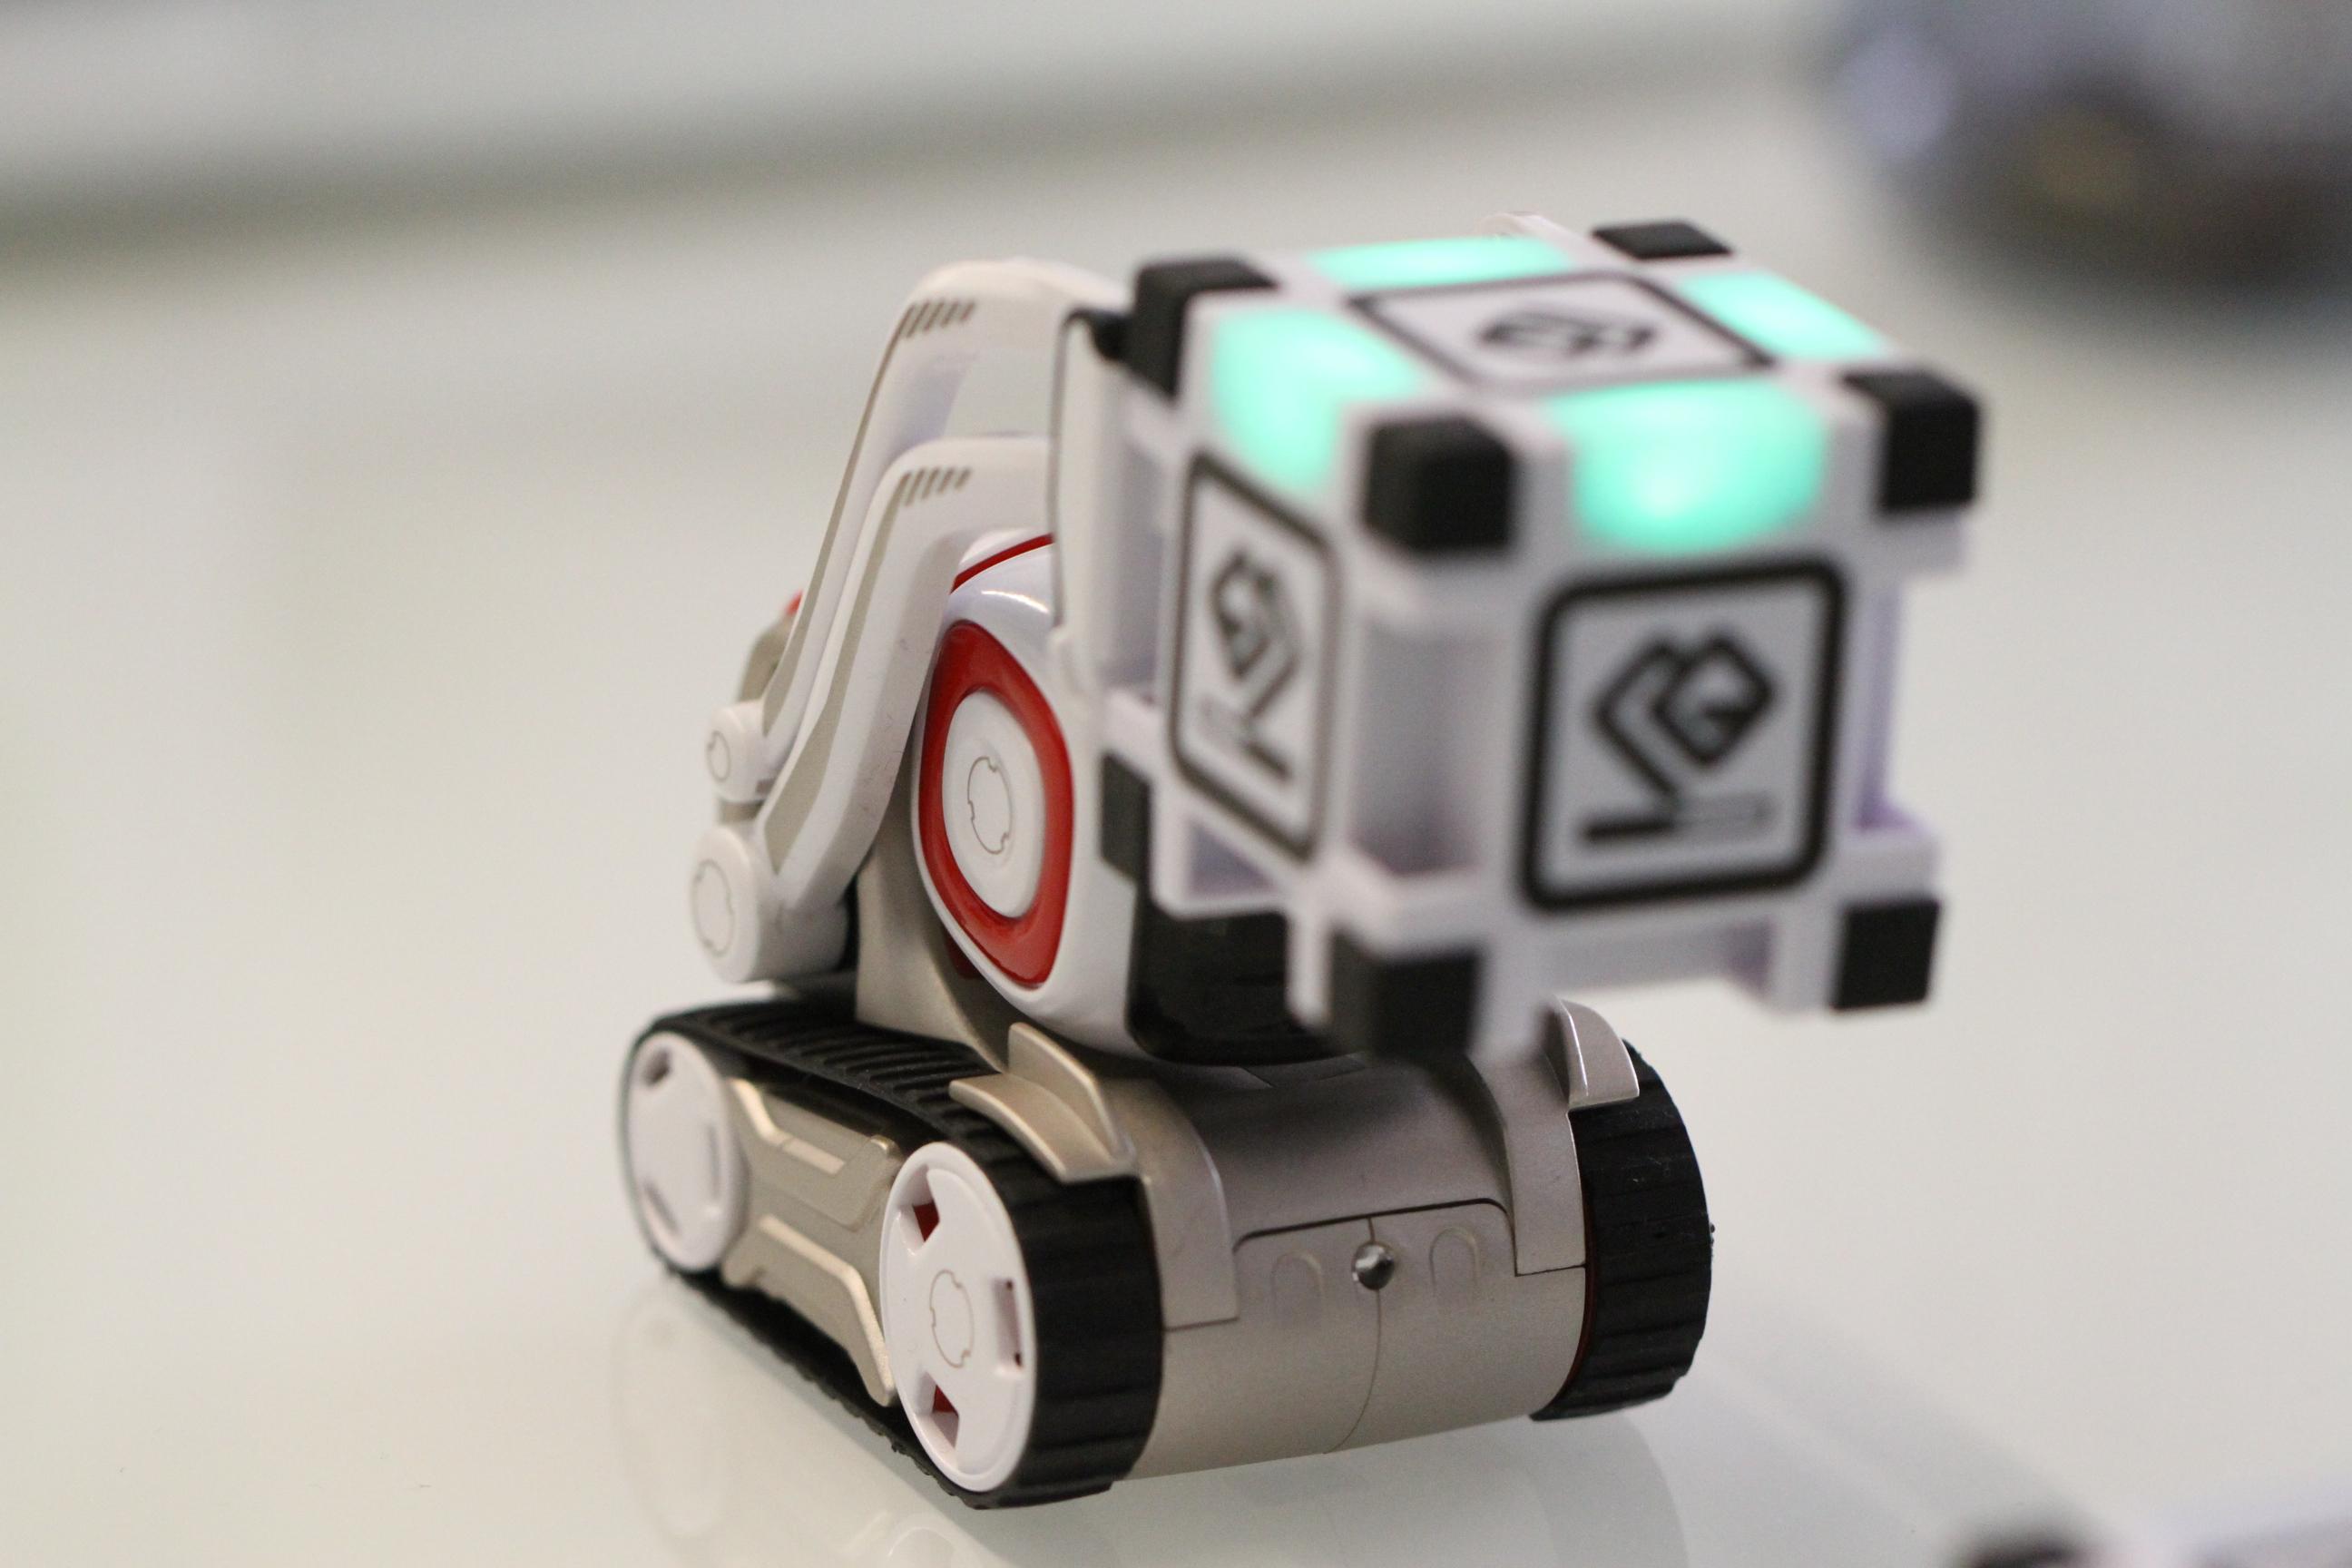 Eye, robot – TechCrunch